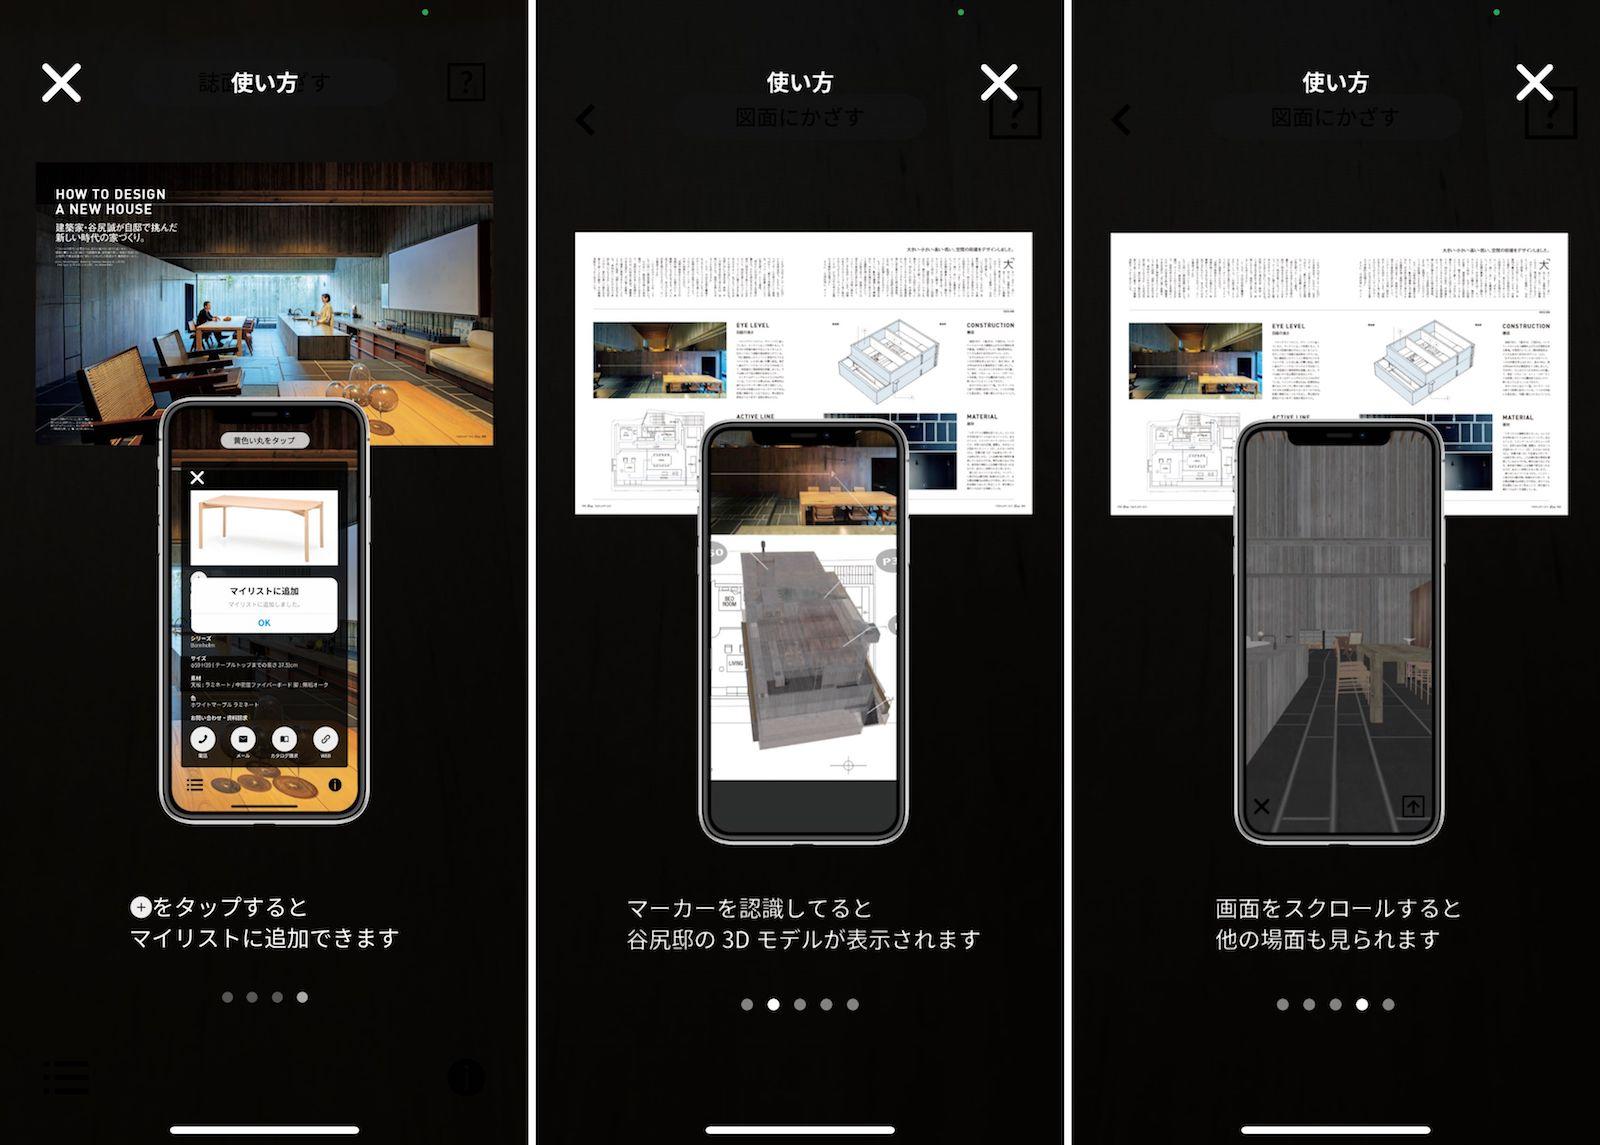 「TECTURE AR」β版 起動中のiPhone画面(左:マイリスト機能、中央:谷尻邸の3Dビュー、右:アプリ限定で可能な内部空間ビュー)